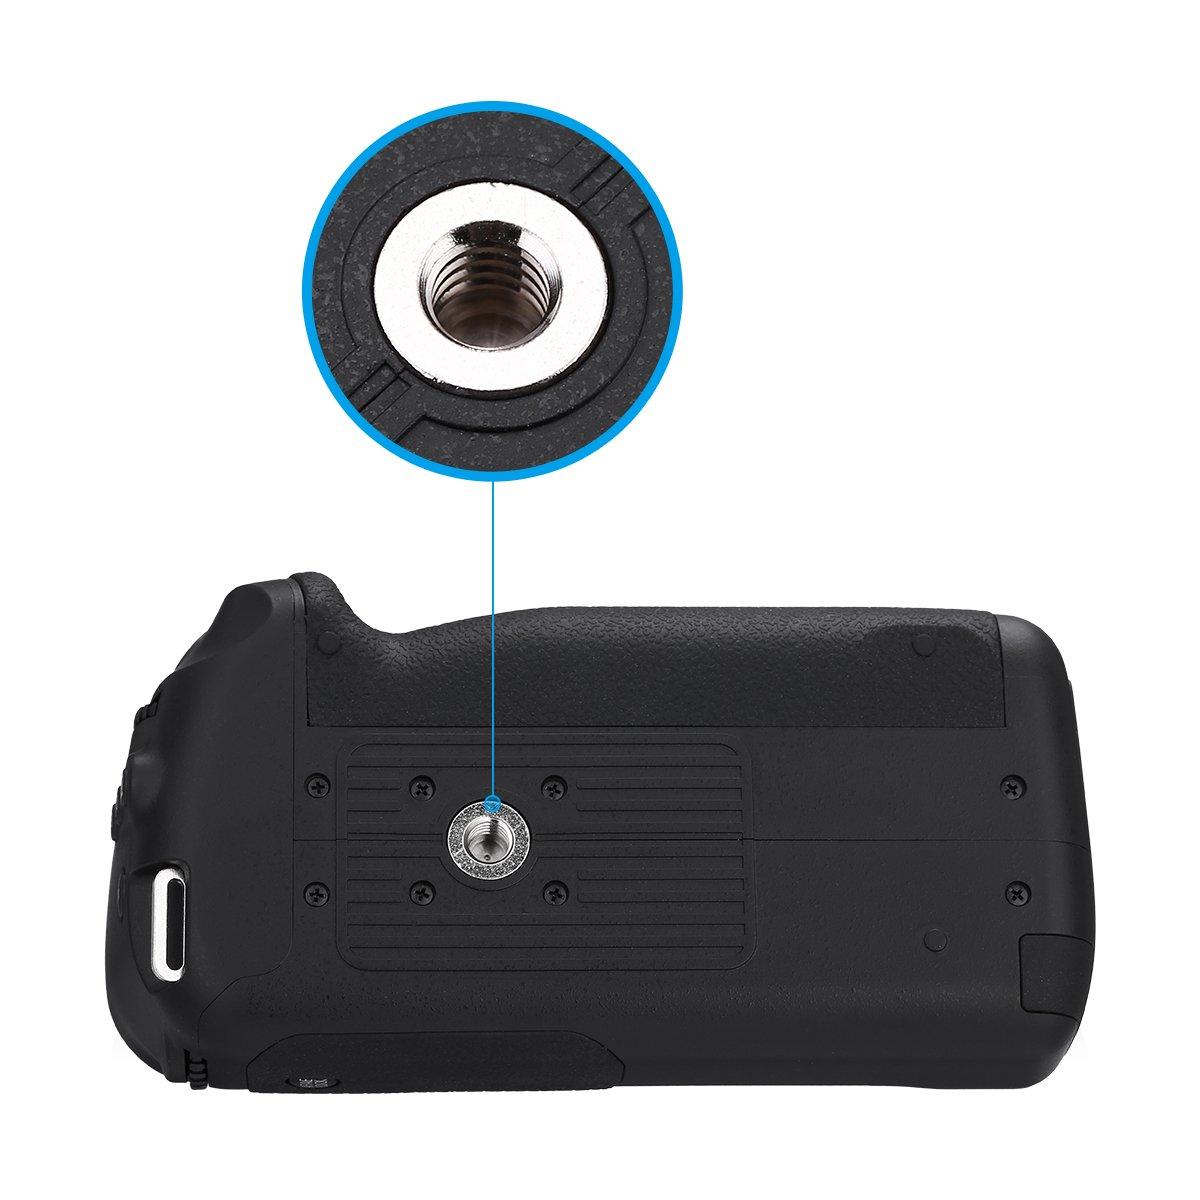 Powerextra Dmw Bggh3 Vertical Battery Grip Replacement Wasabi Blf19 Kit For Panasonic Gh3 Gh4 Gh5 Lumix Digital Slr Camera Photo